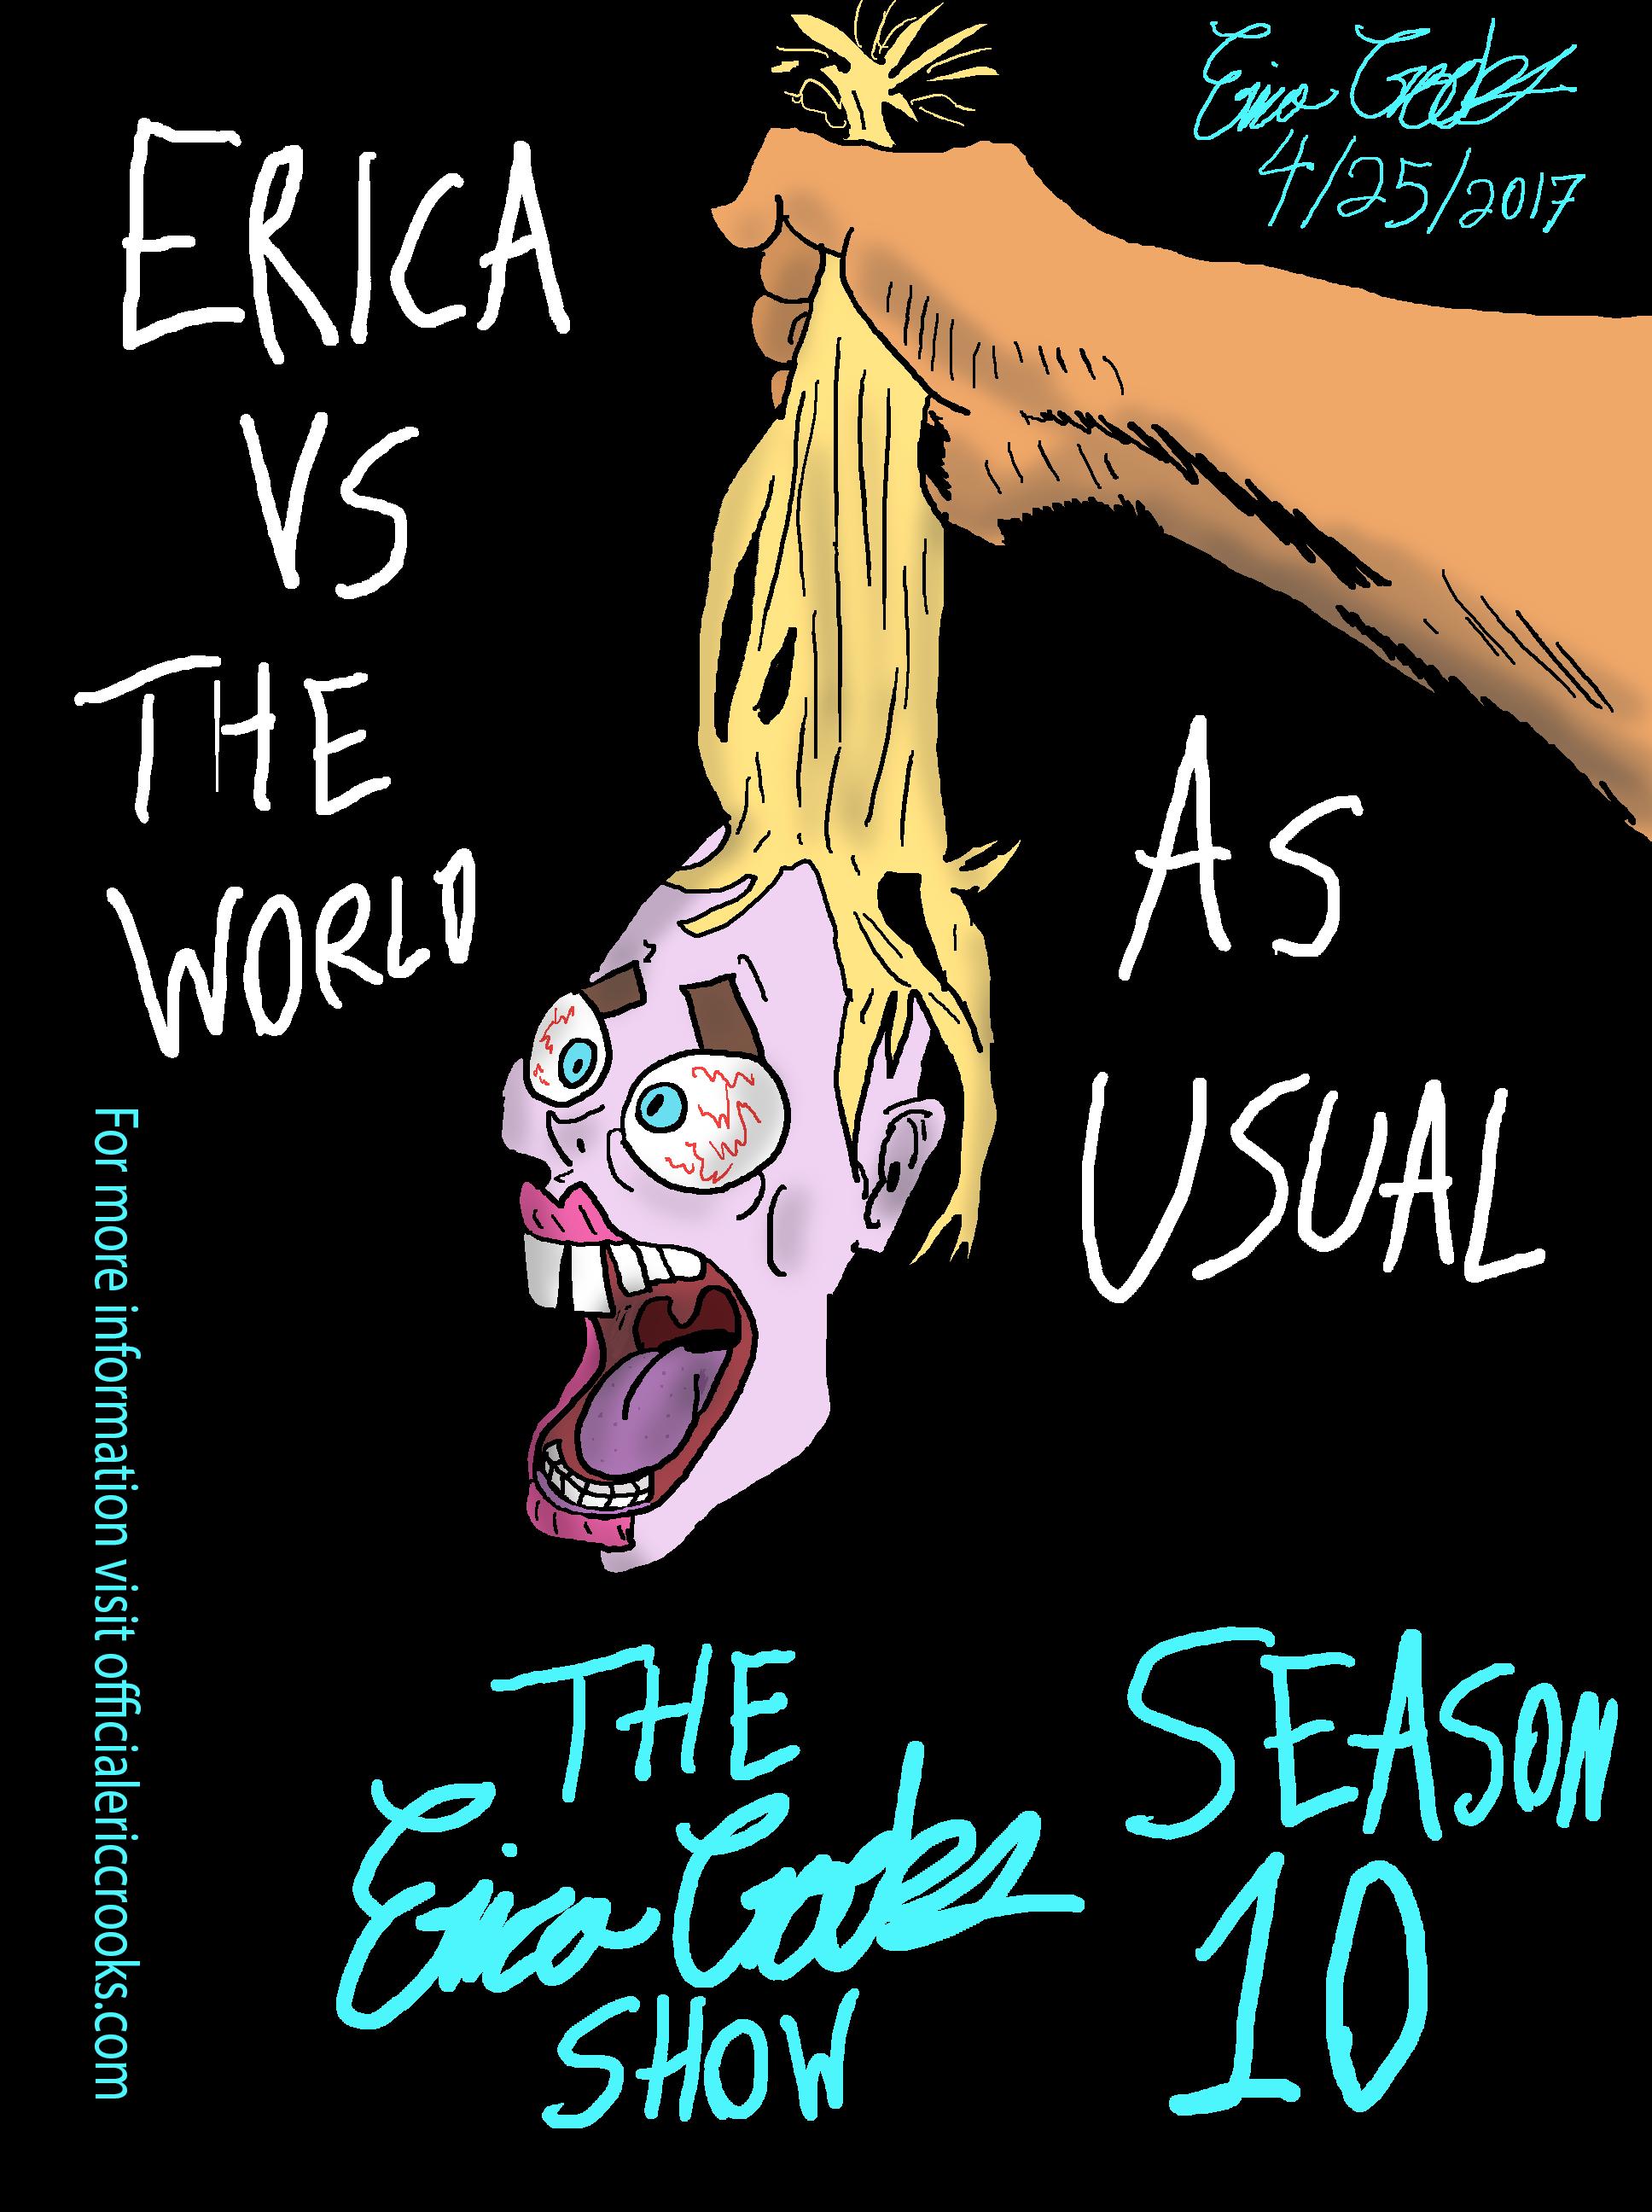 The Erica Crooks Show Season 10 Promo Art ( 2017 )